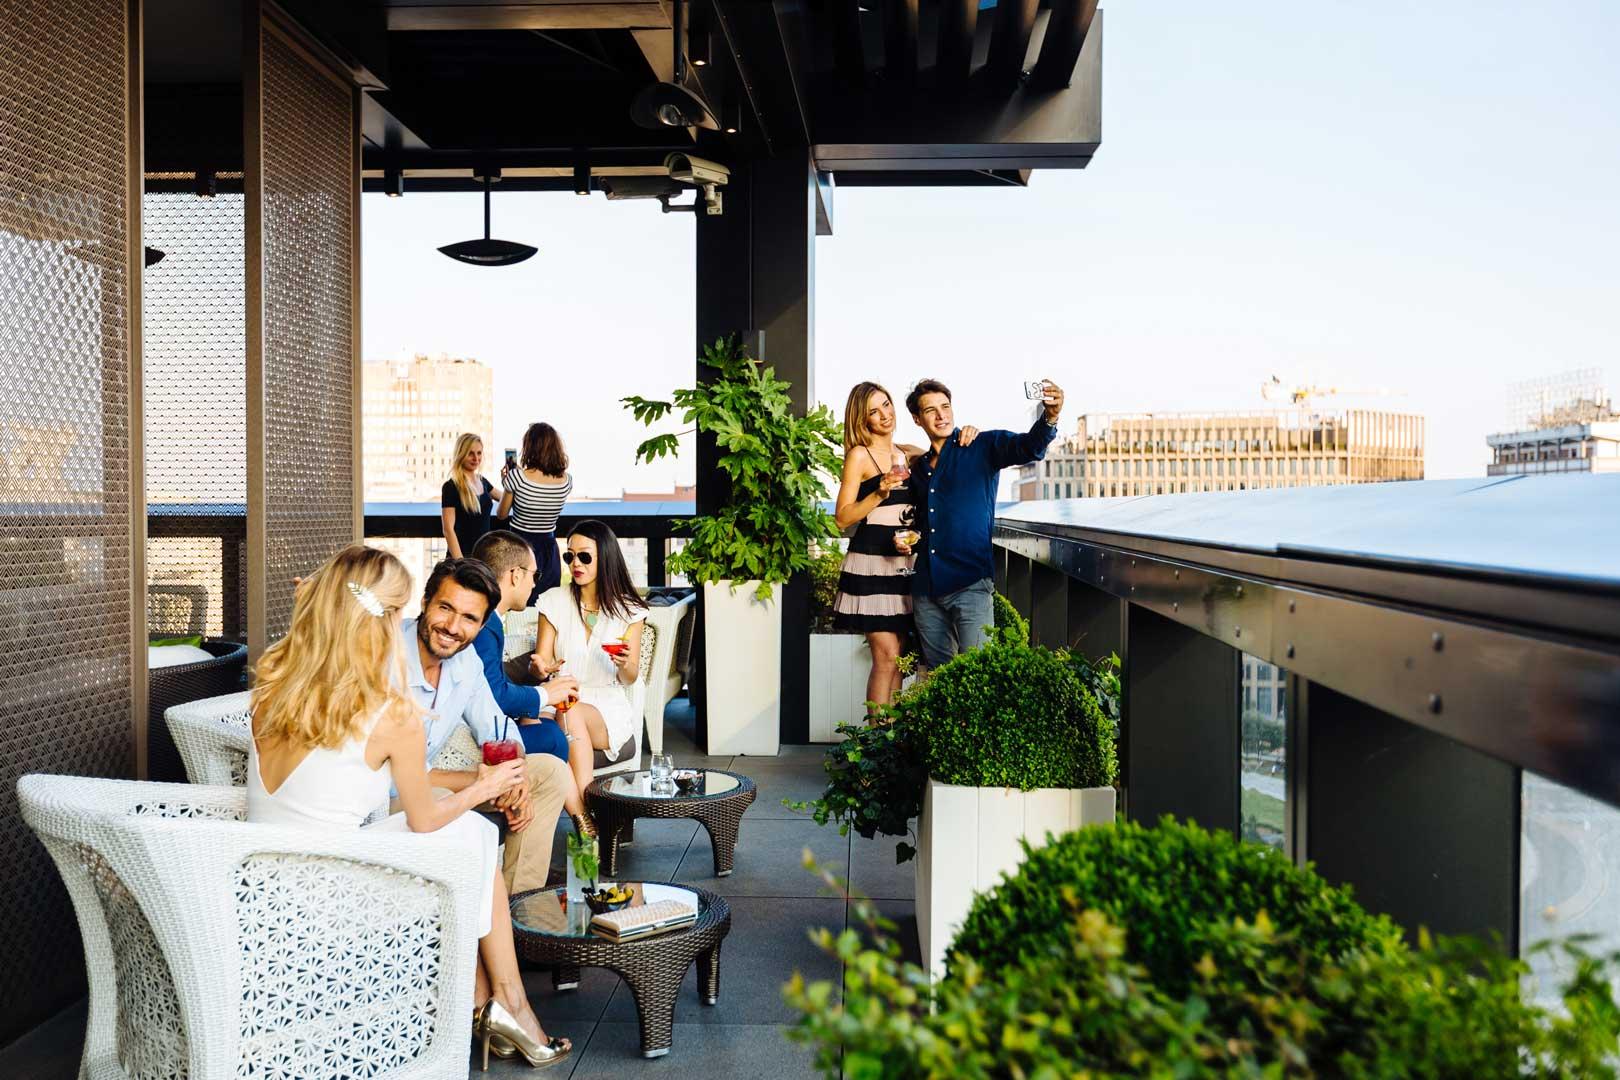 terrazze-piu-belle-di-milano-aperitivo-cover